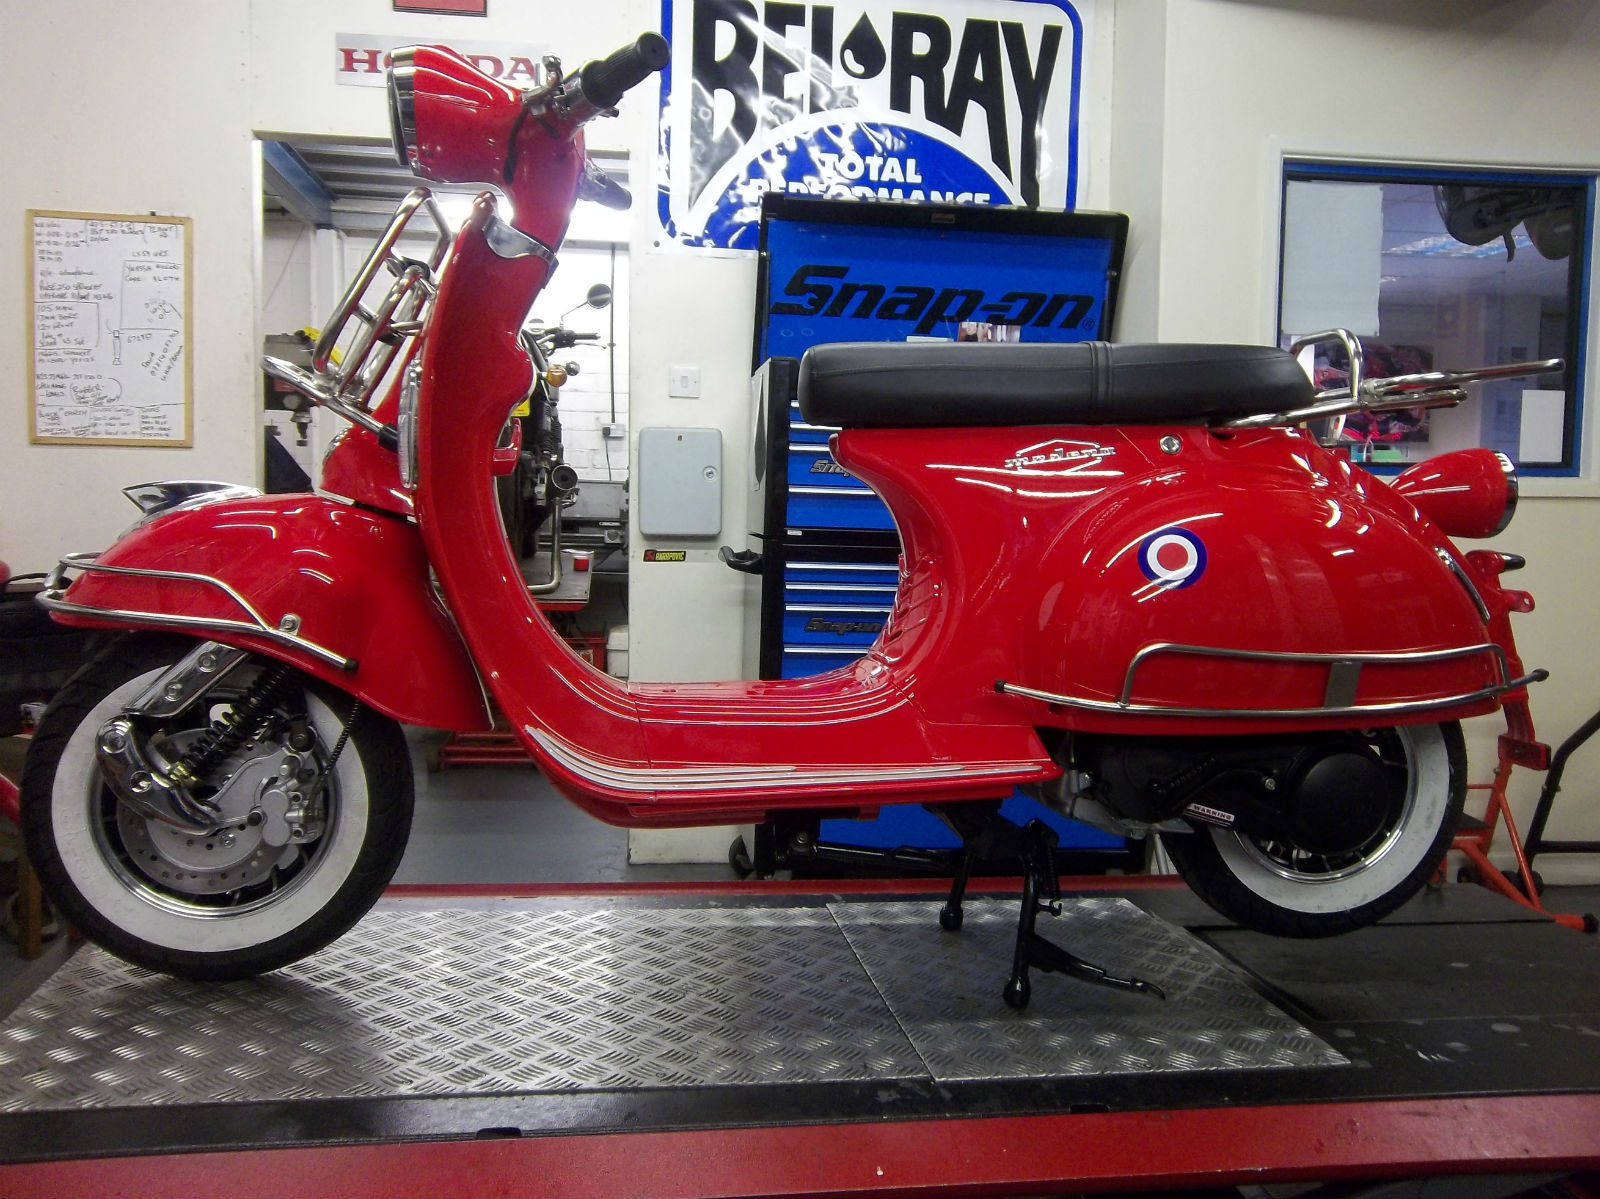 ajs modena 125 50 cc scooter vespa 125 cc 1950 60 39 s body. Black Bedroom Furniture Sets. Home Design Ideas